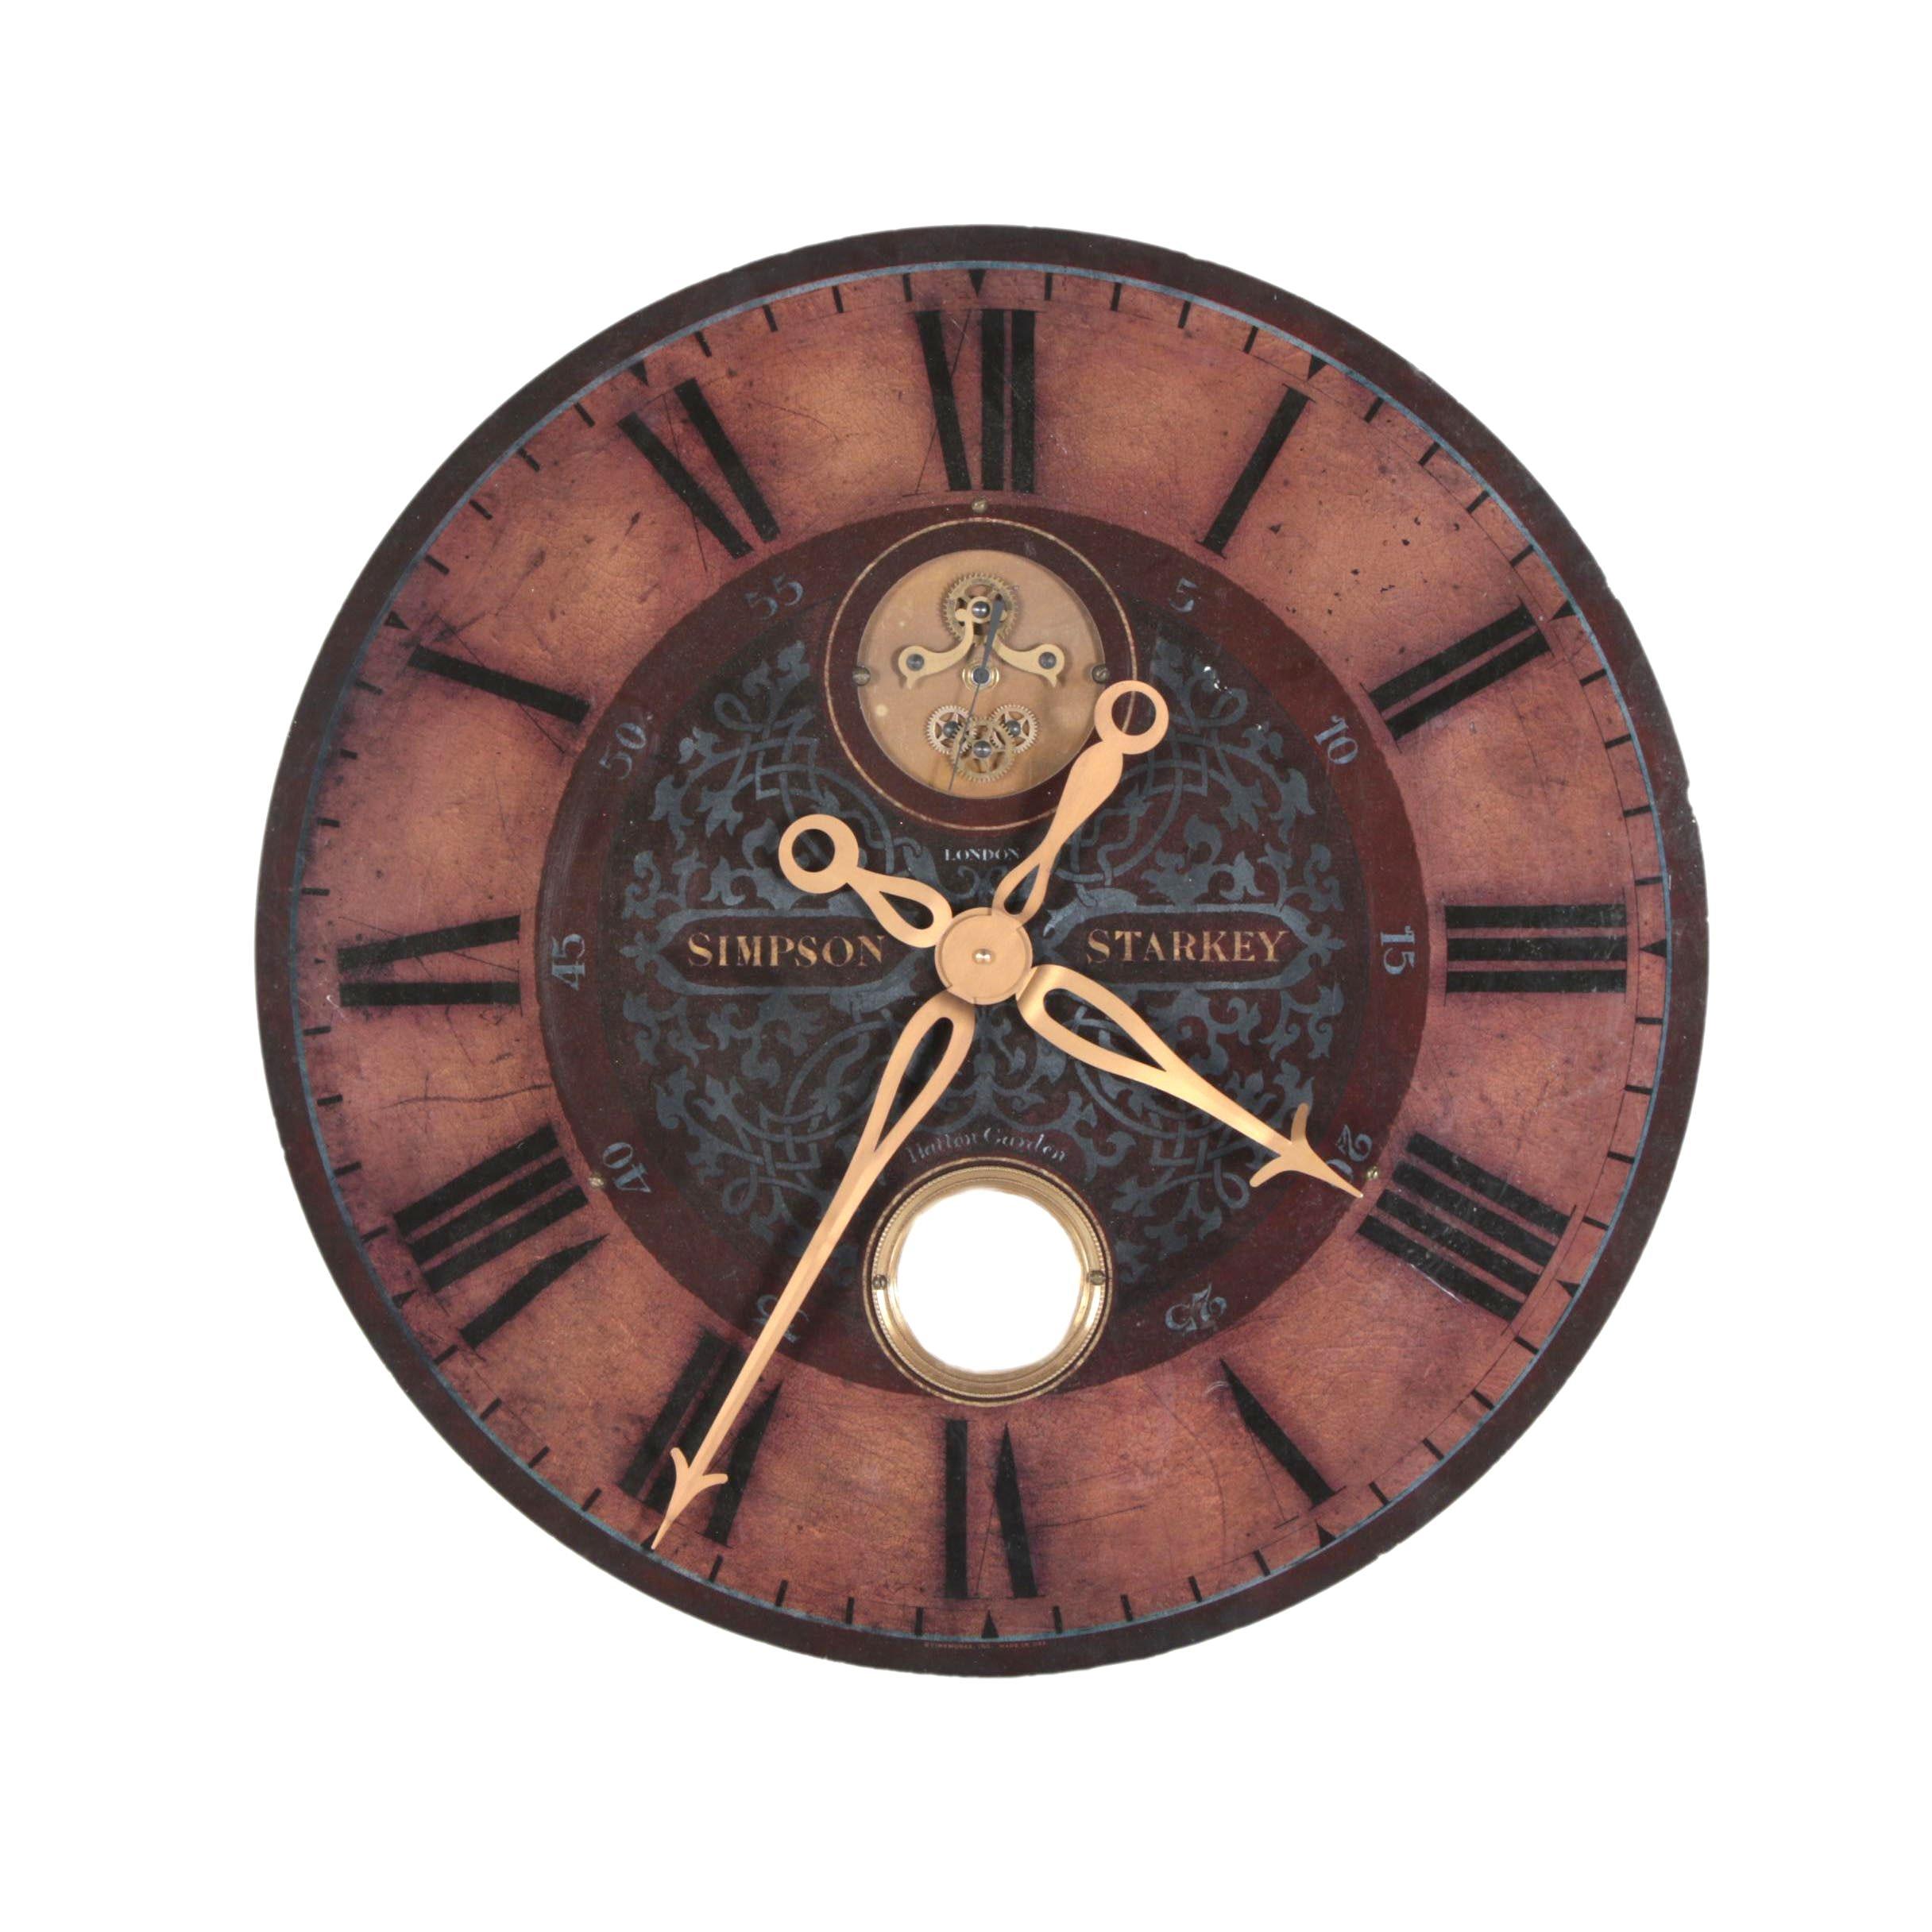 Vintage Style Simpson Starkey Authentic Timeworks Wall Clock